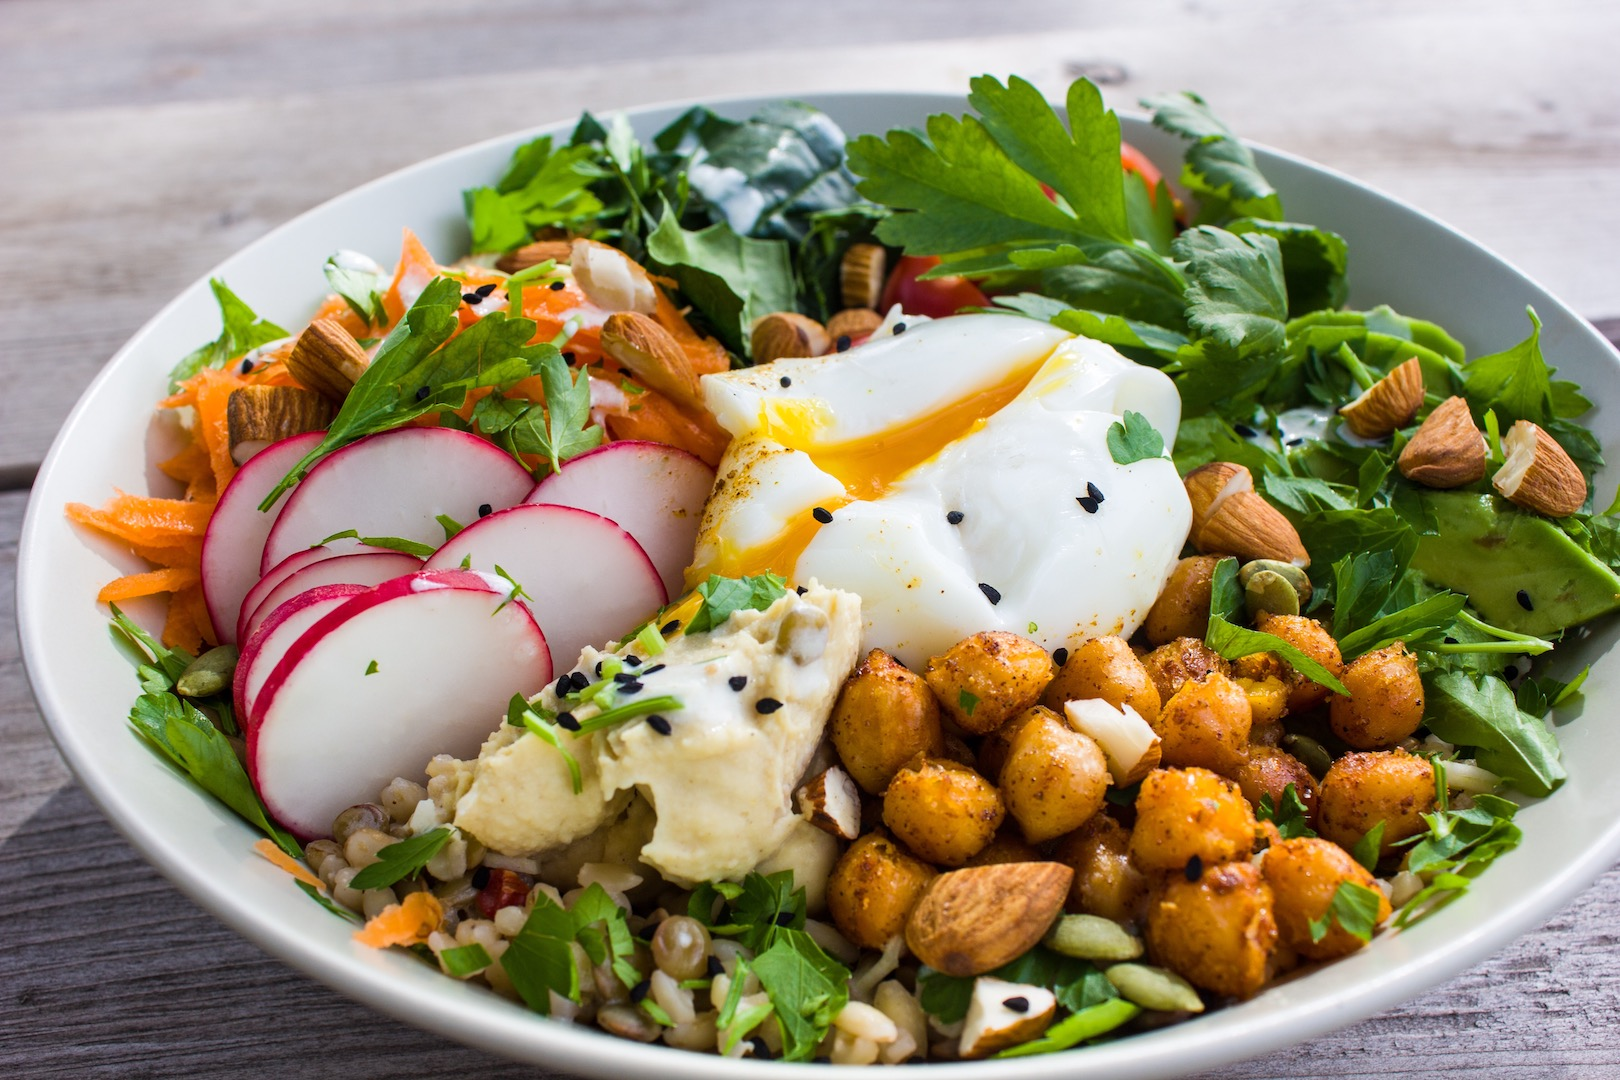 Healthy_savory_breakfast_bowl_egg_avocado_vegetarian_gluten_free